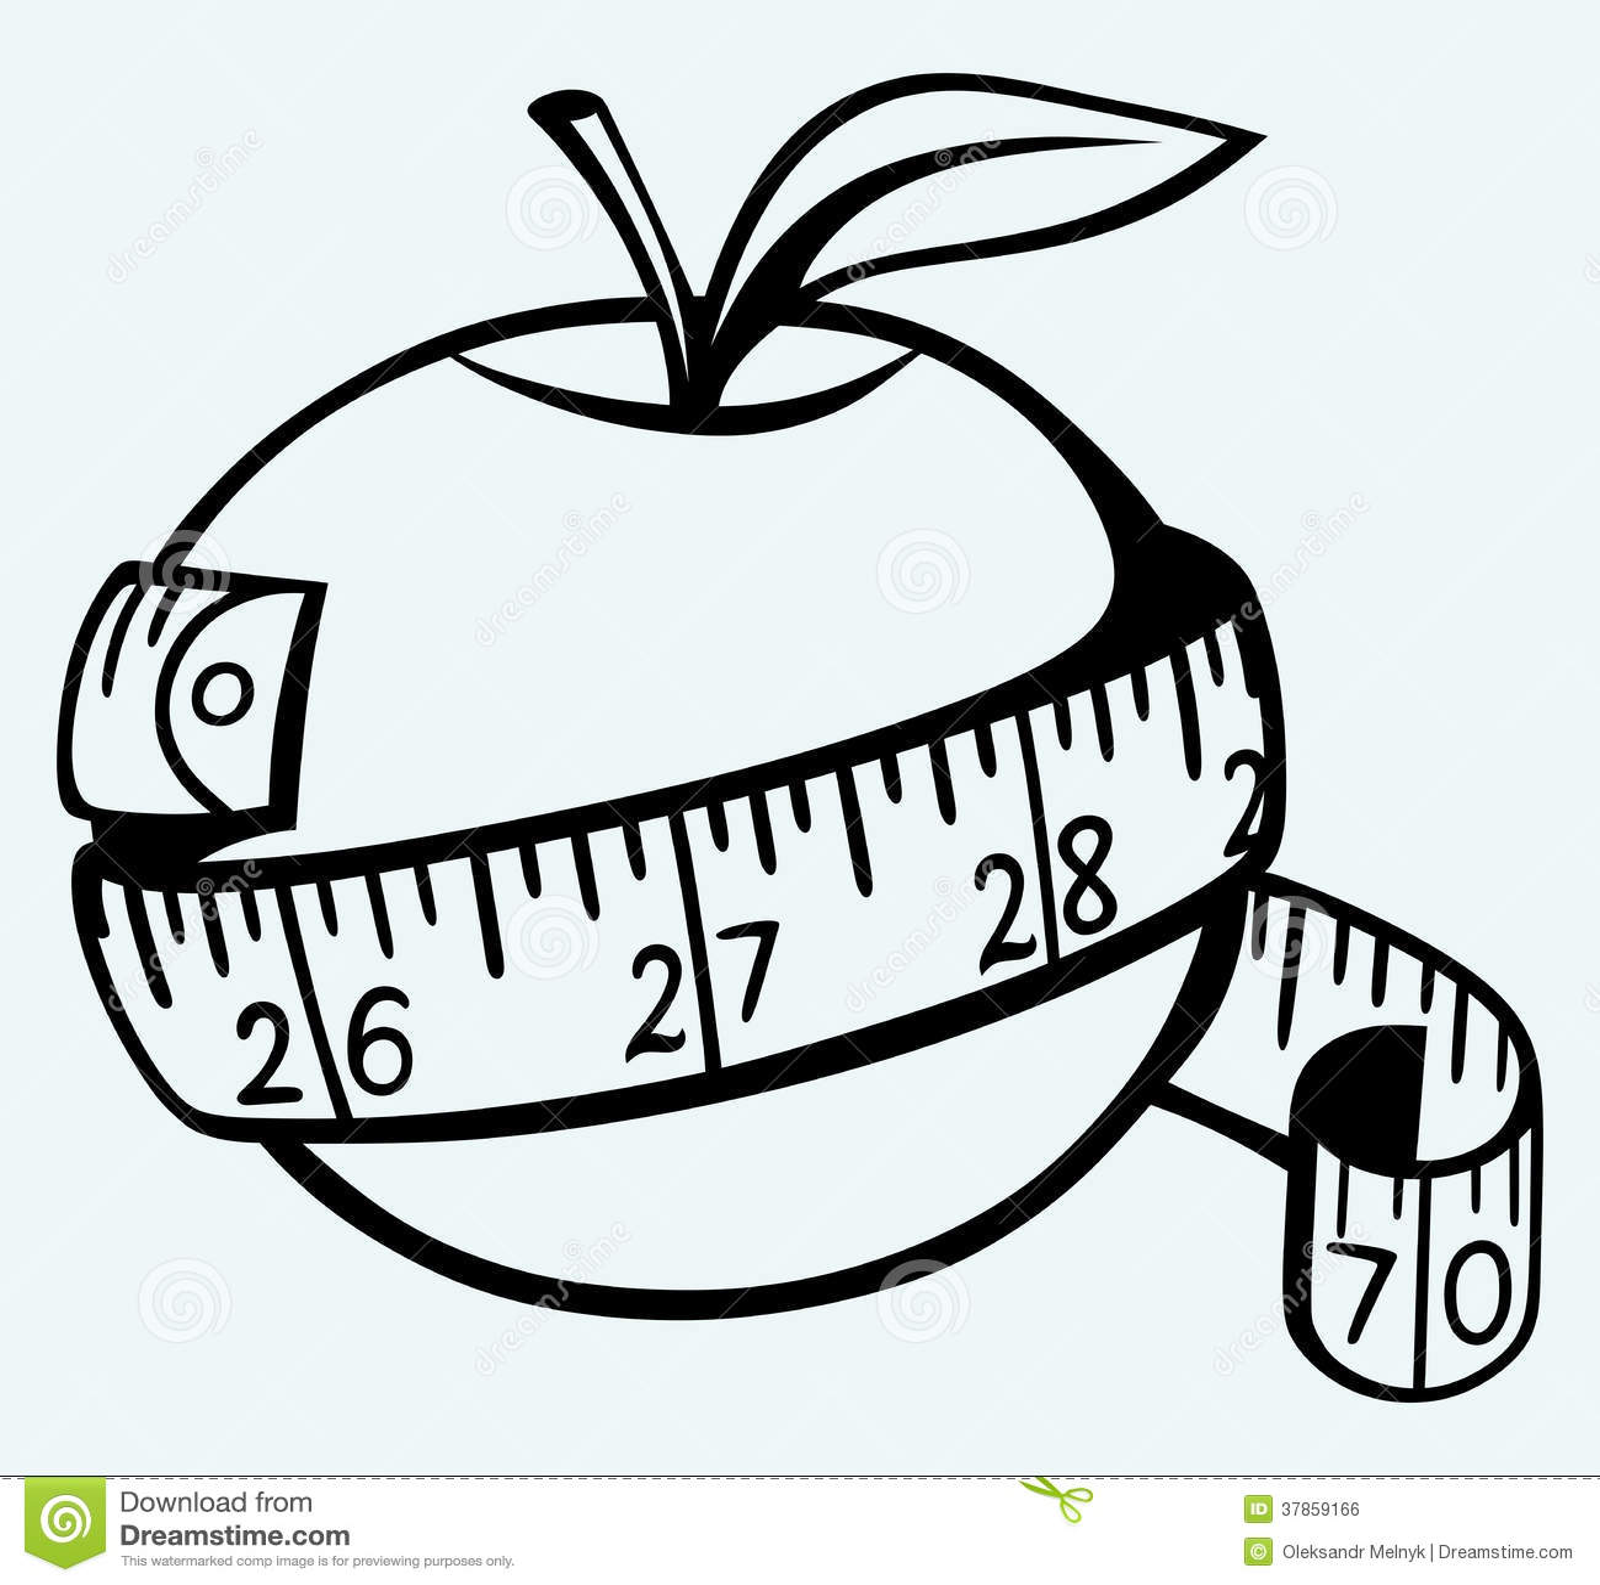 Tape Measure Svg Measuring Tape Sewing Tailor Svg Ruler | Etsy